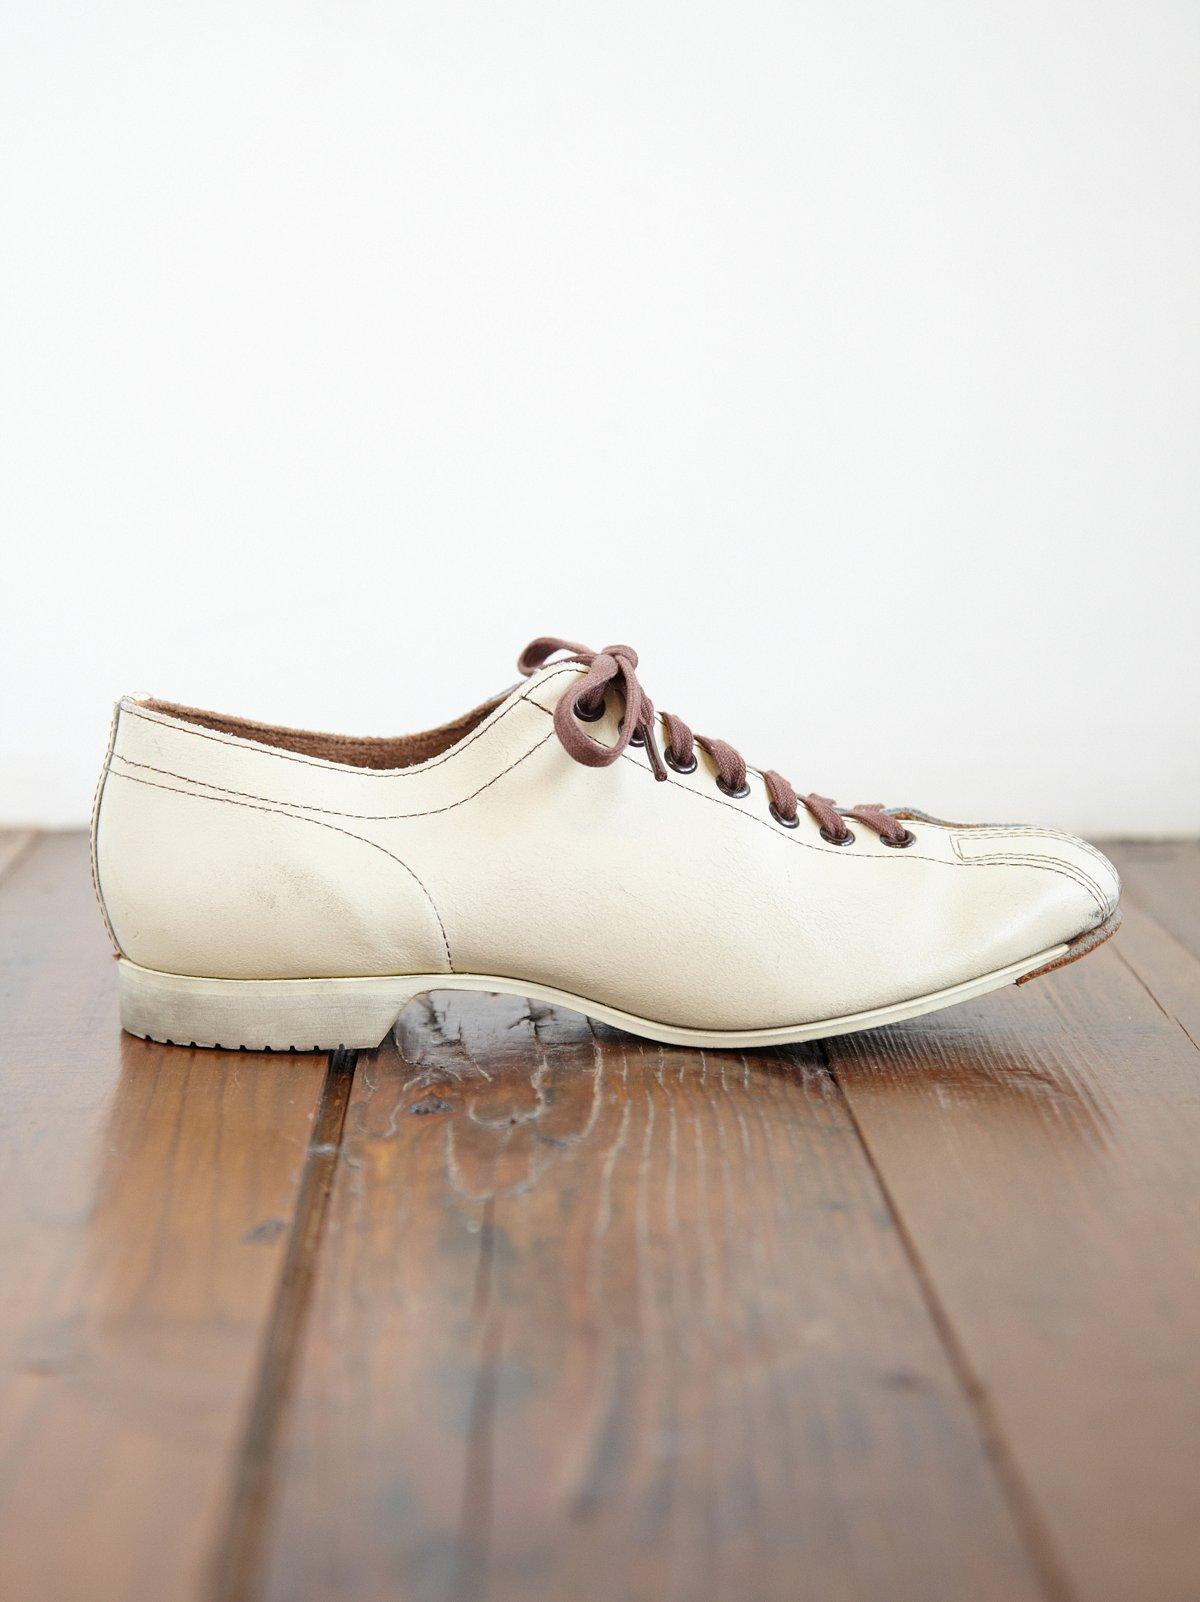 Vintage Bowling Shoes